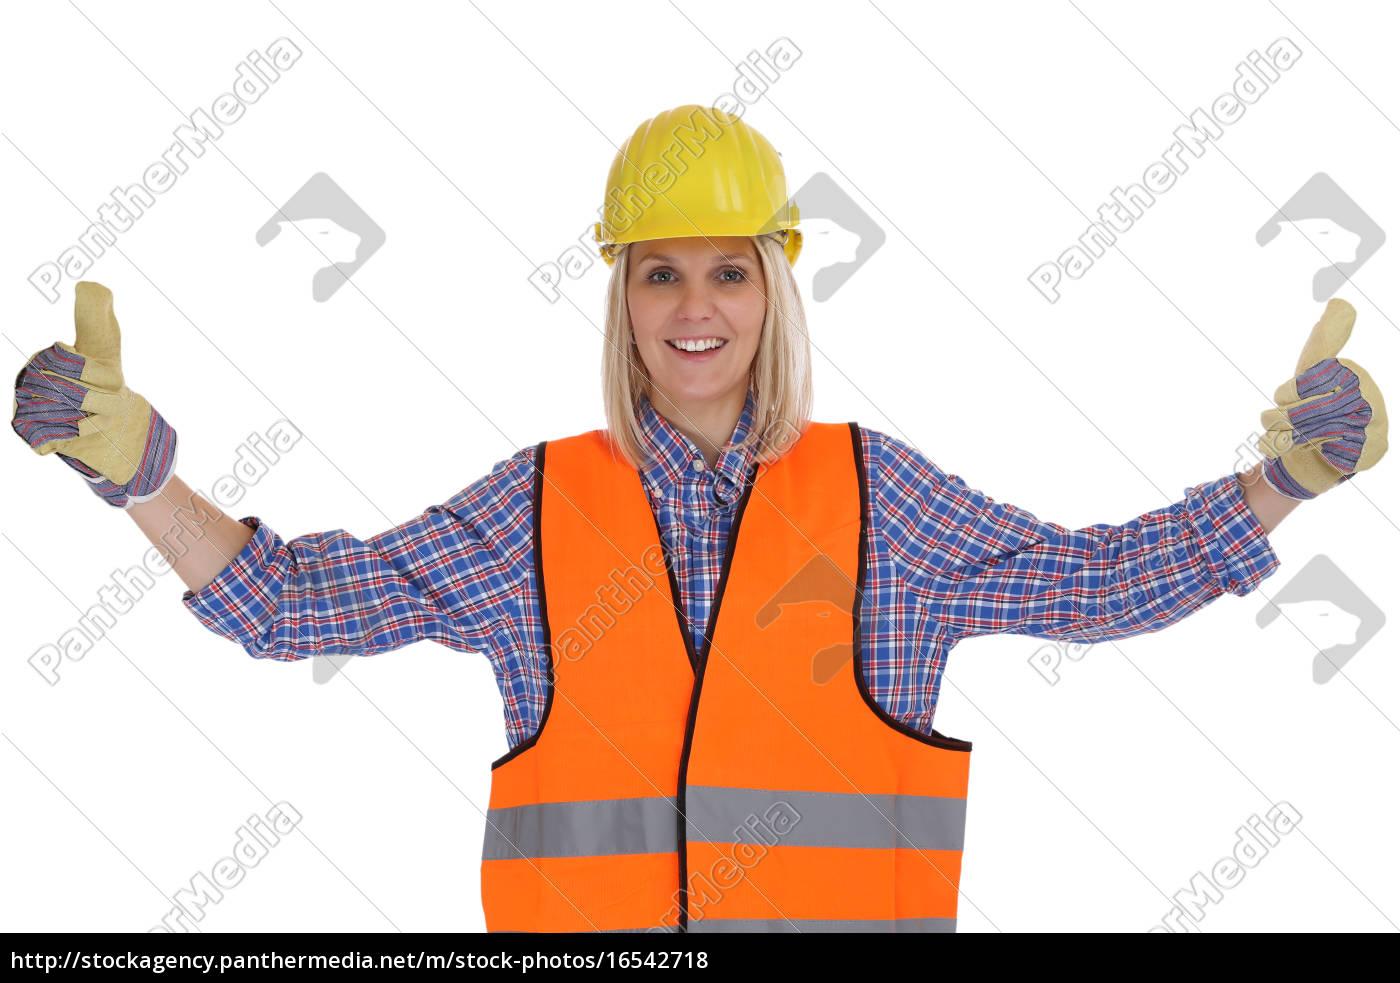 Bauarbeiter Junge Frau Bauarbeiterin Beruf Arbeiter Stock Photo